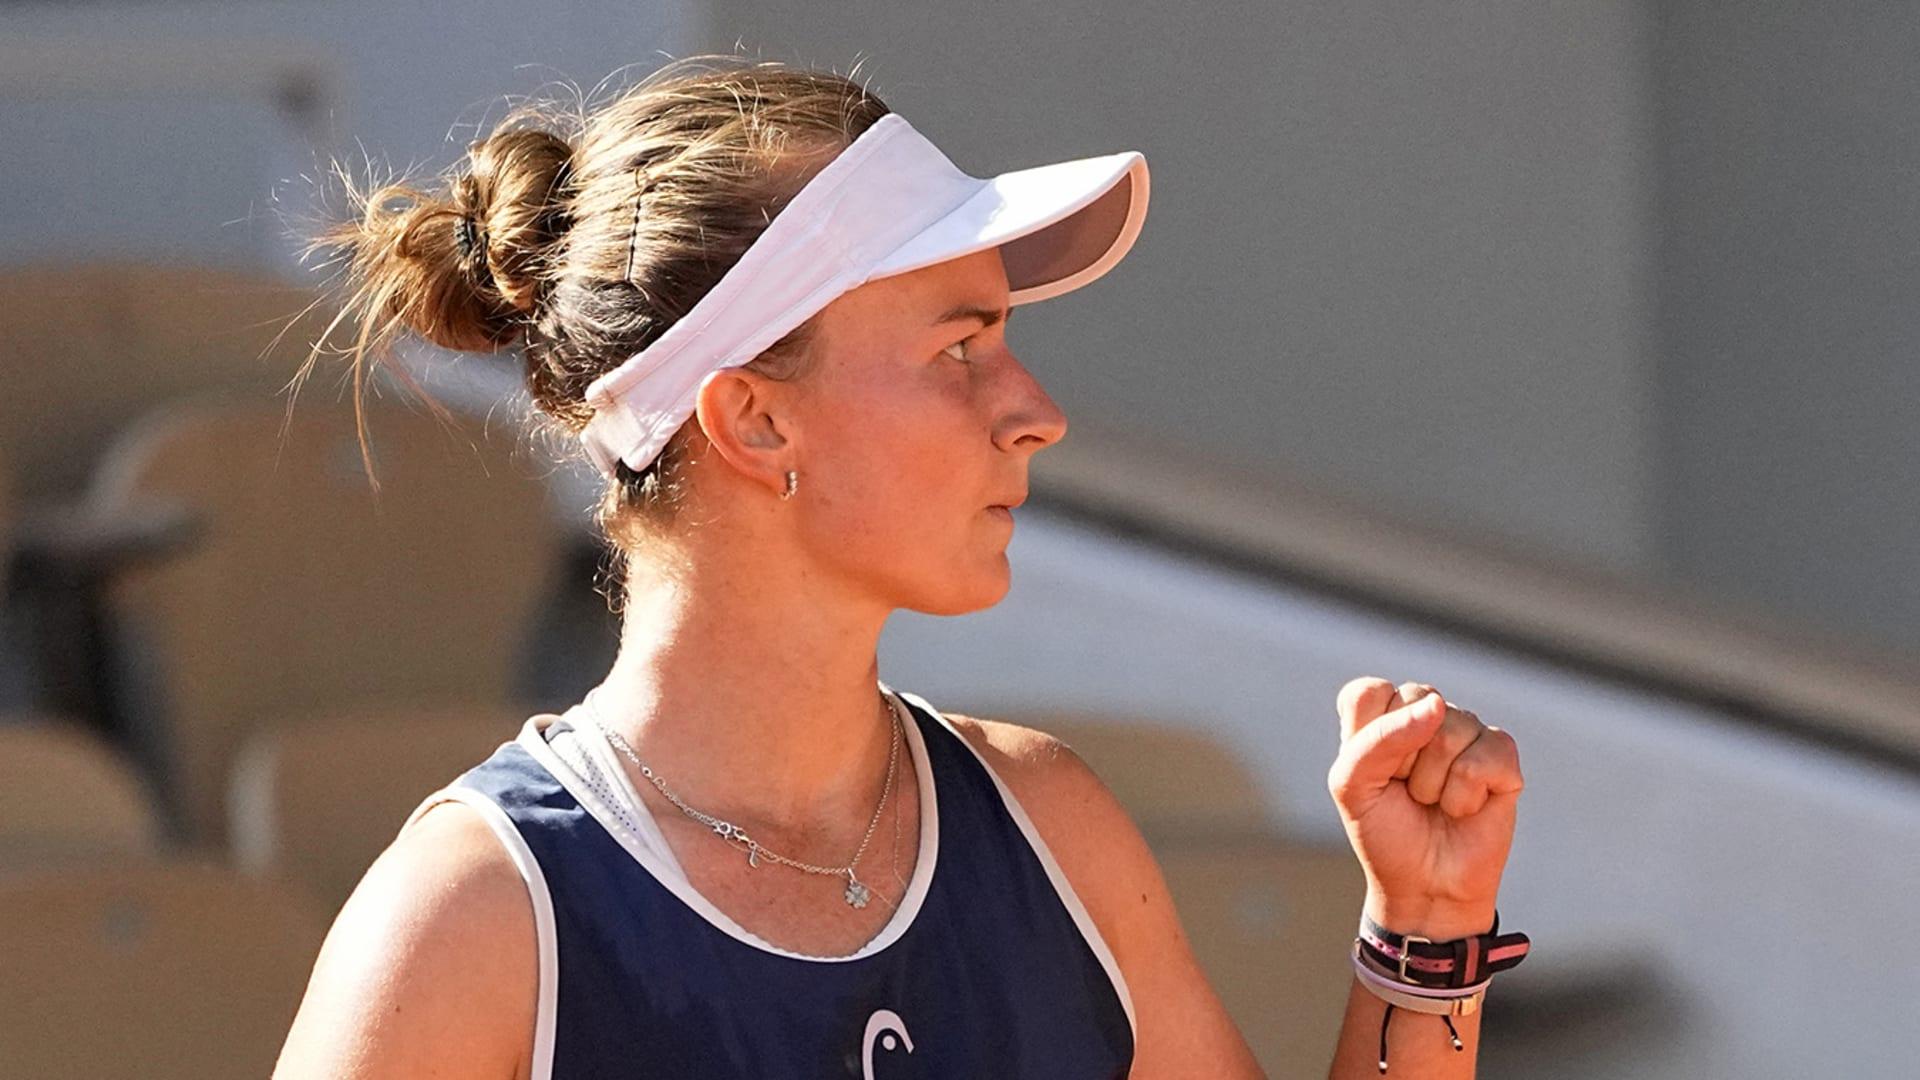 French Open 2021: Barbora Krejcikova wins 3-hour thriller vs Maria Sakkari to acquire spot in final